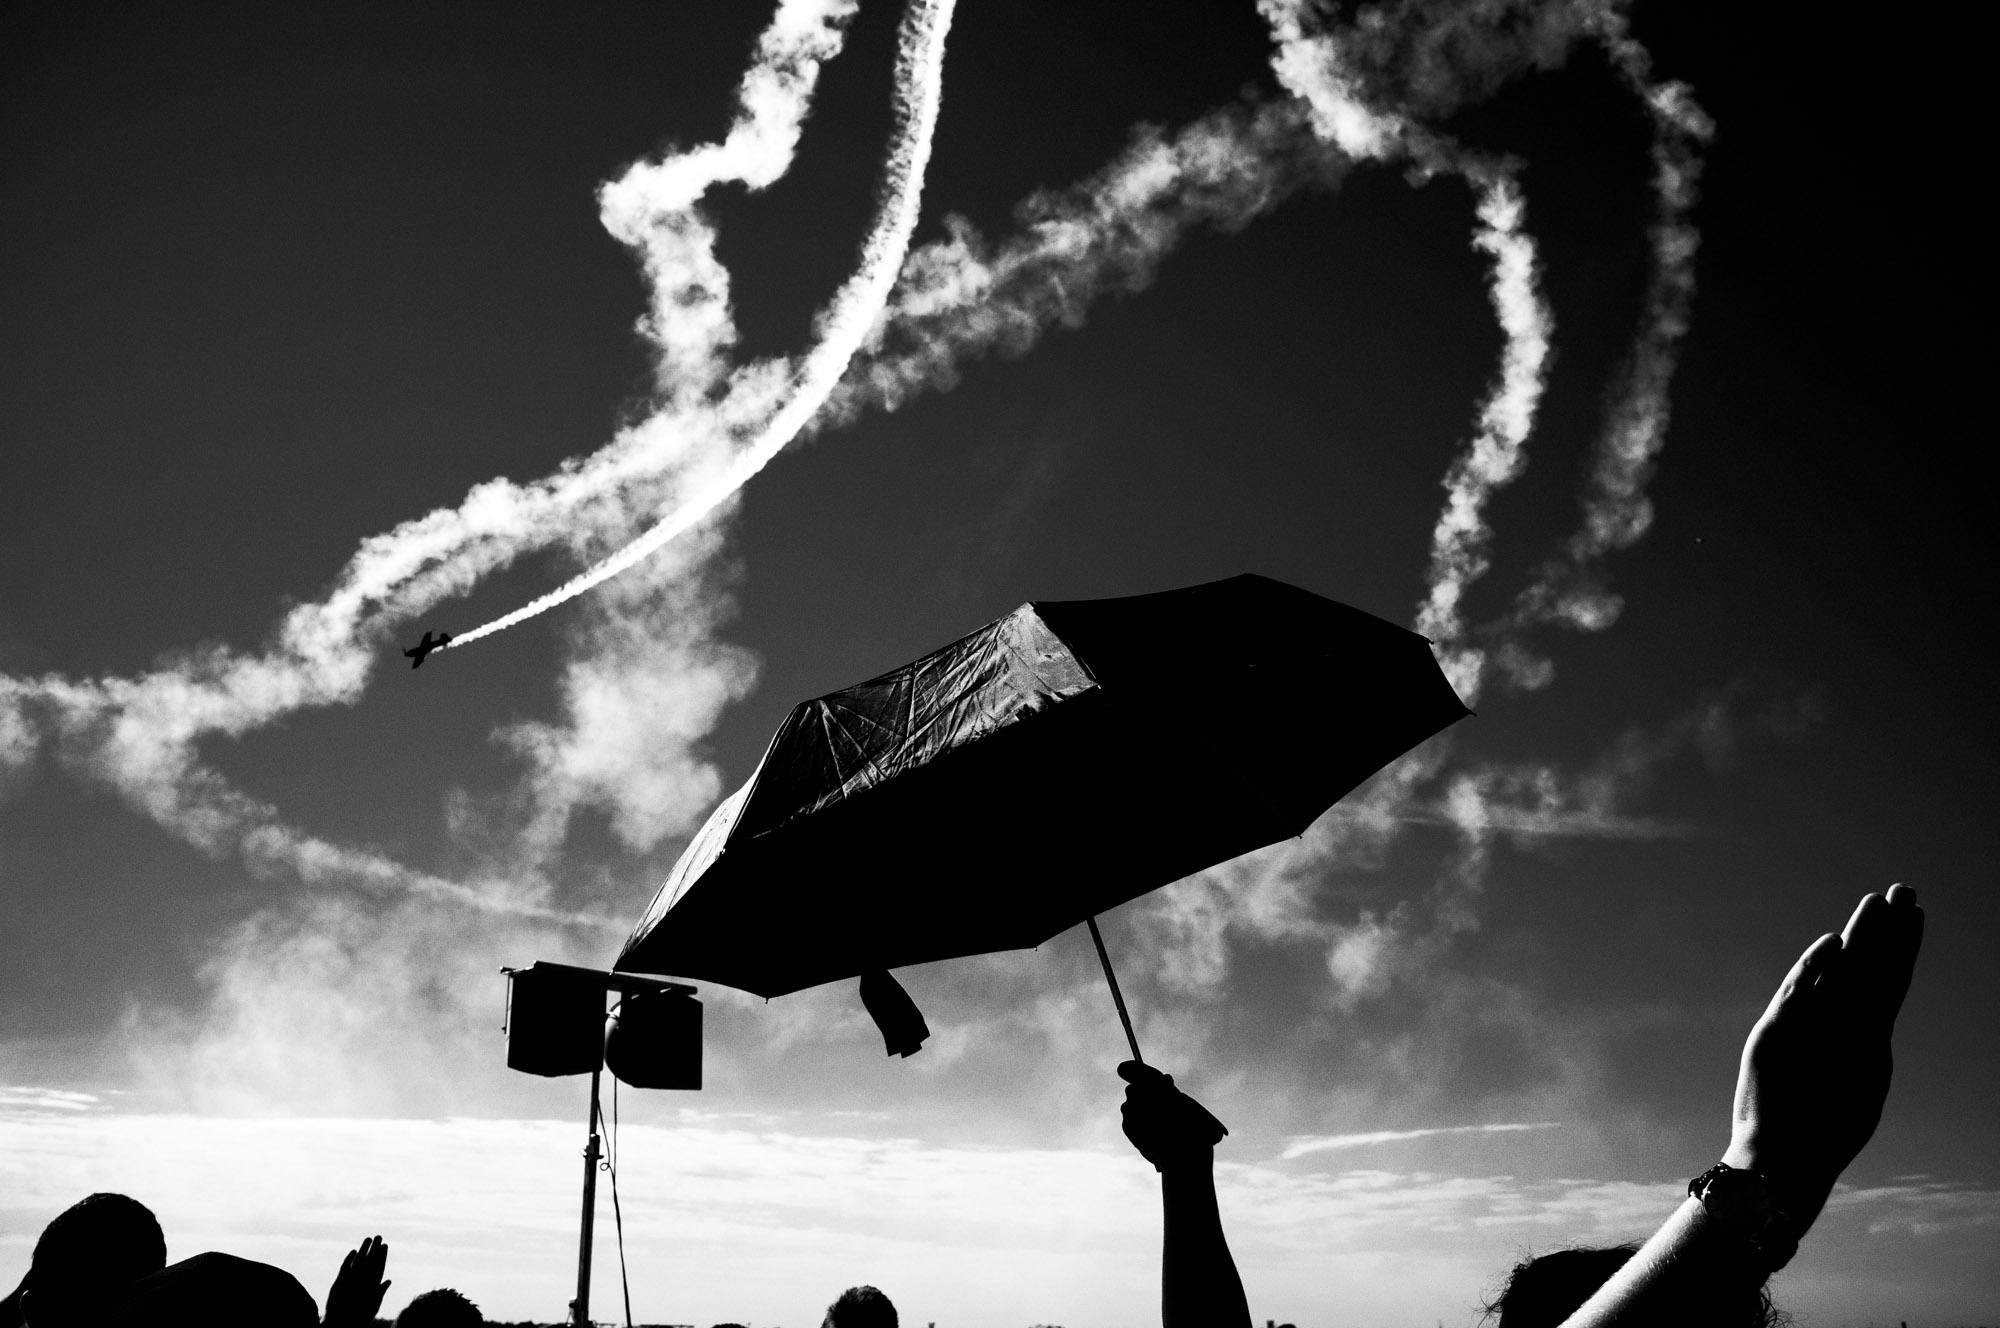 Homestead, FL - 2012